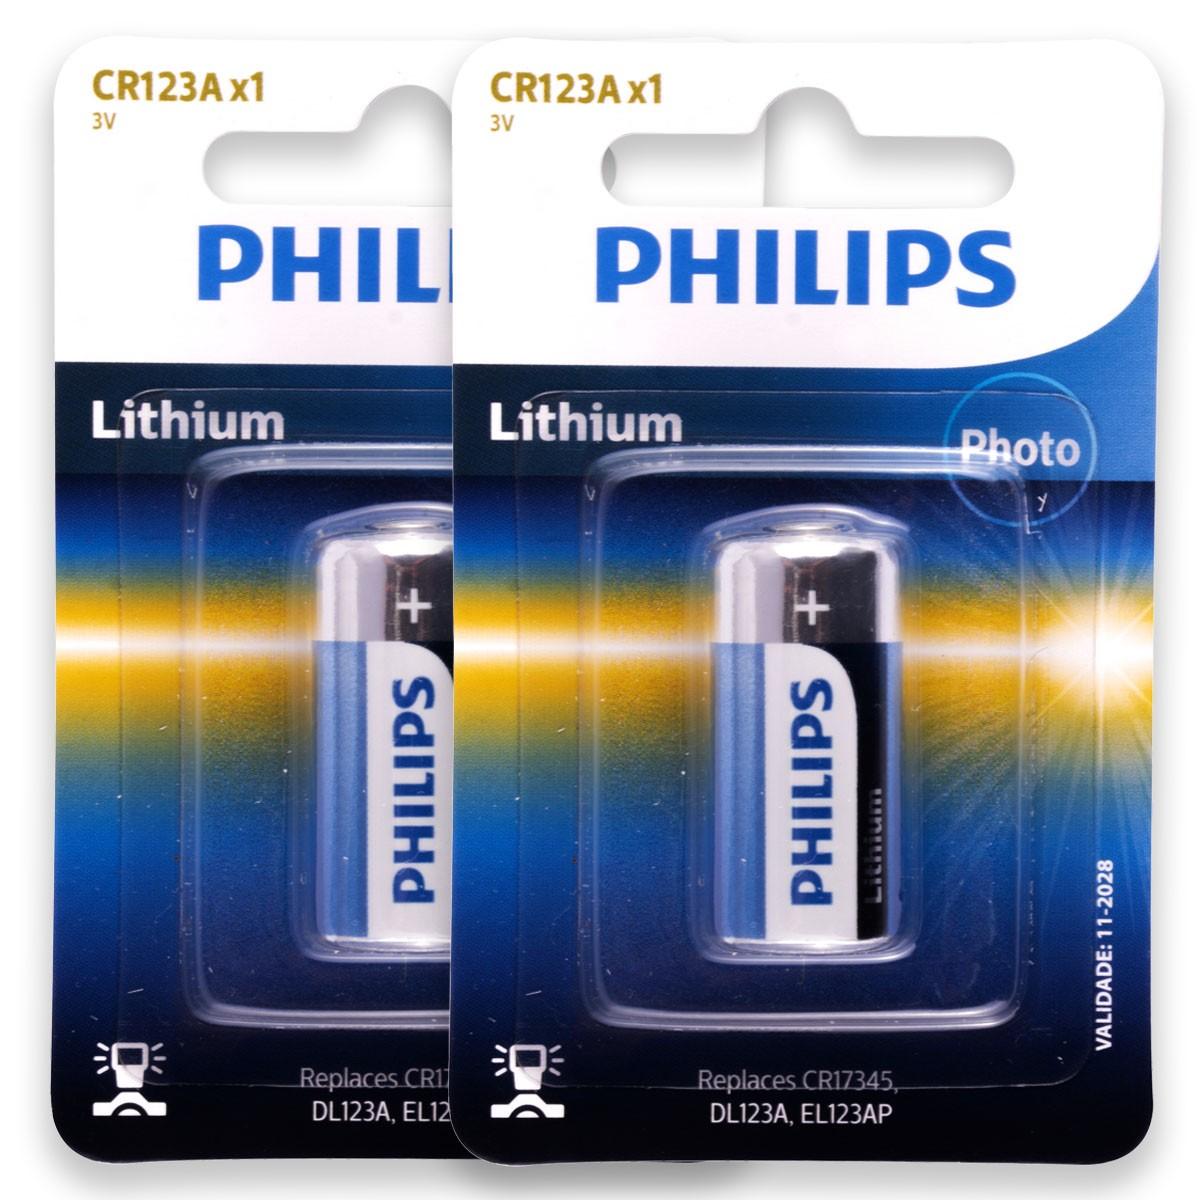 02 Pilha Bateria CR123 PHILIPS 2 cartelas